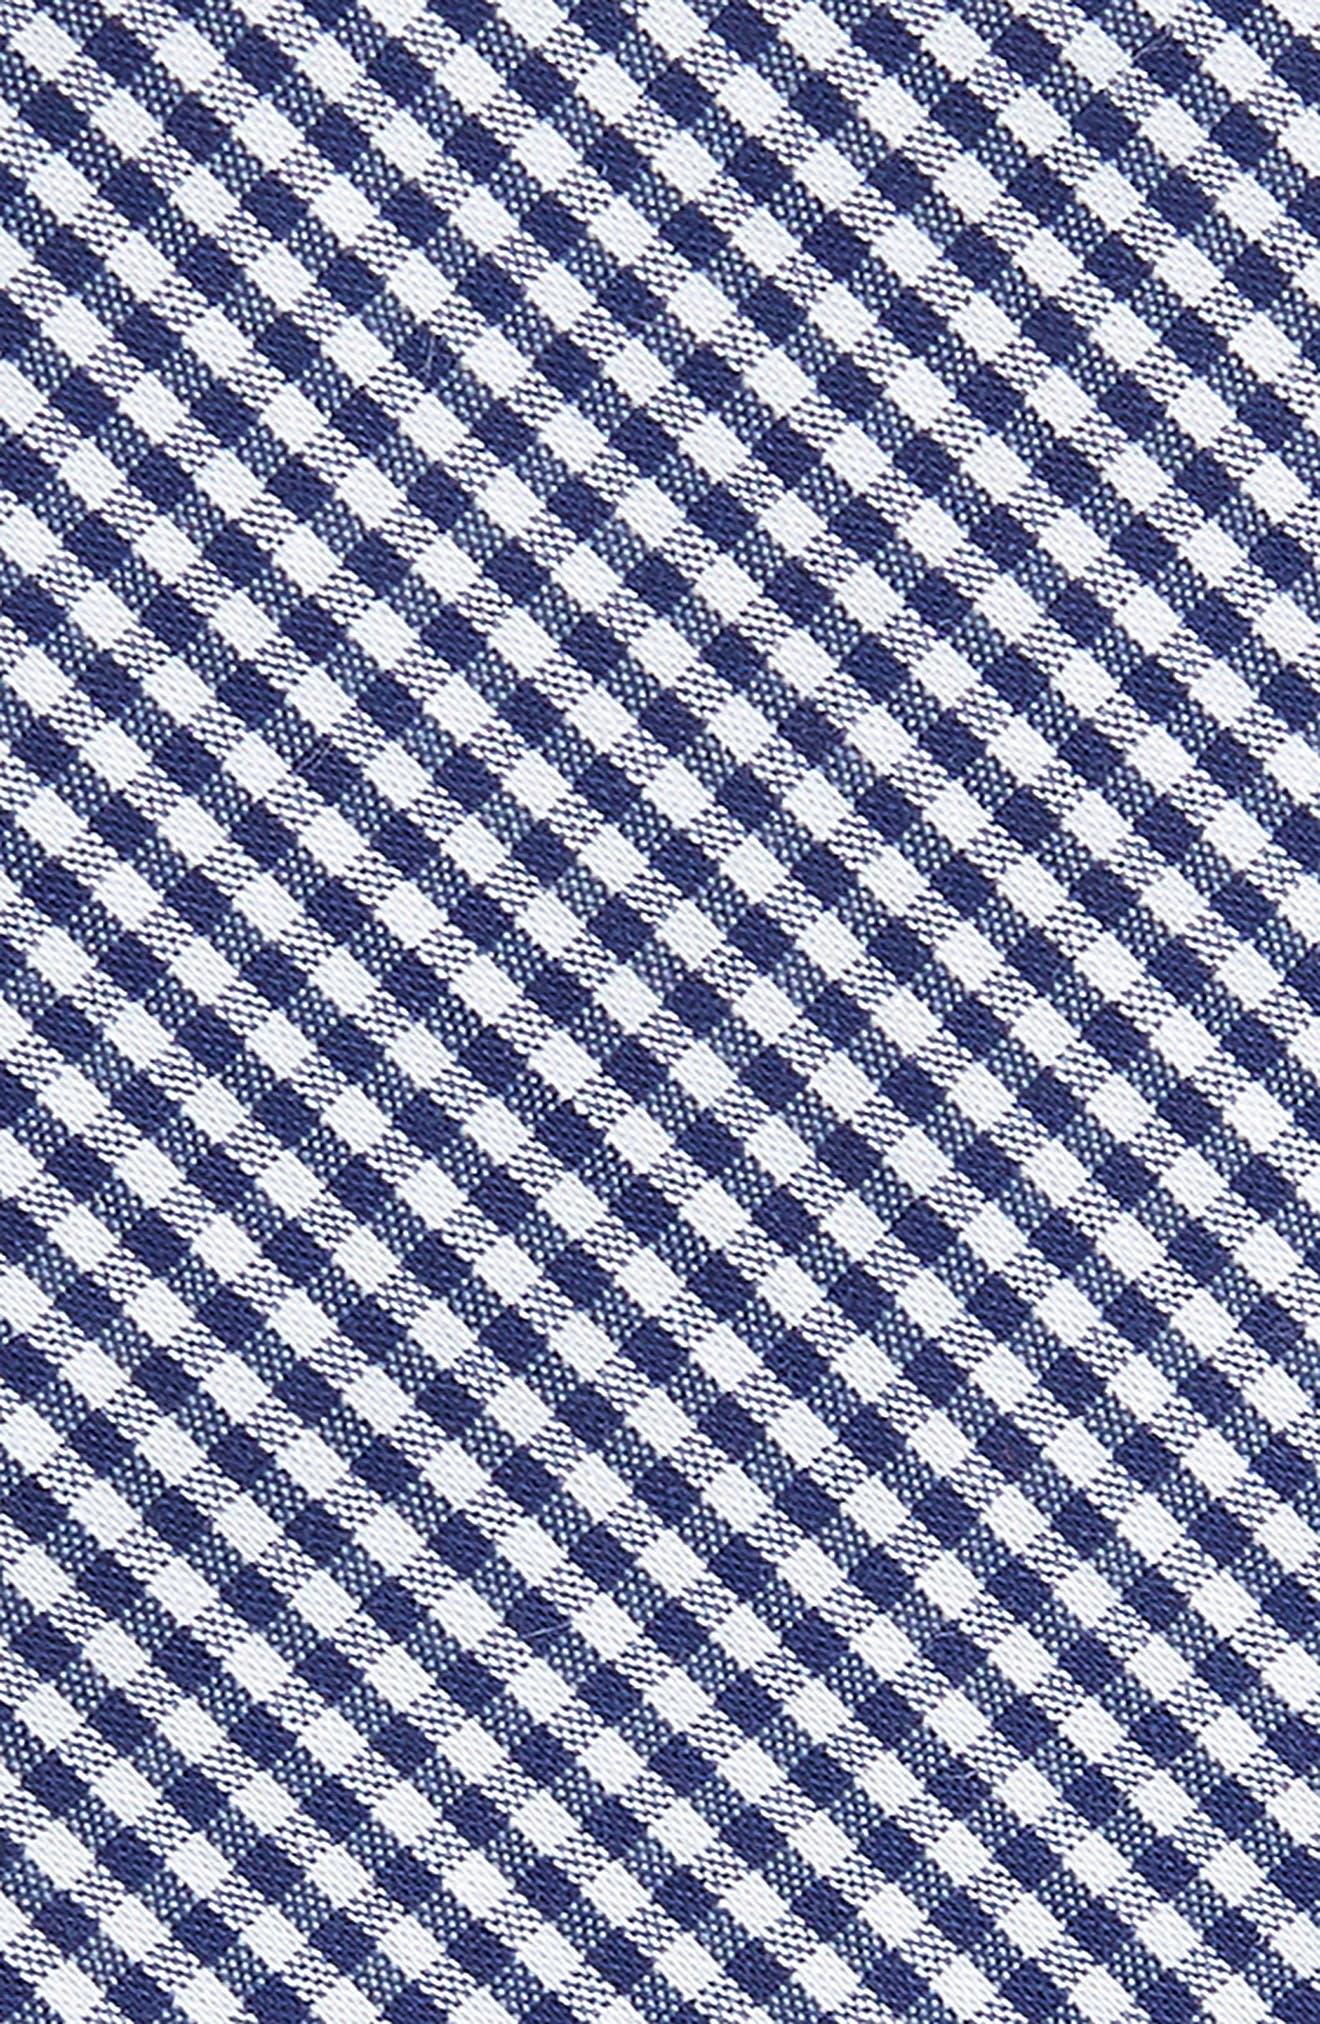 Sydney Check Cotton Skinny Tie,                             Alternate thumbnail 4, color,